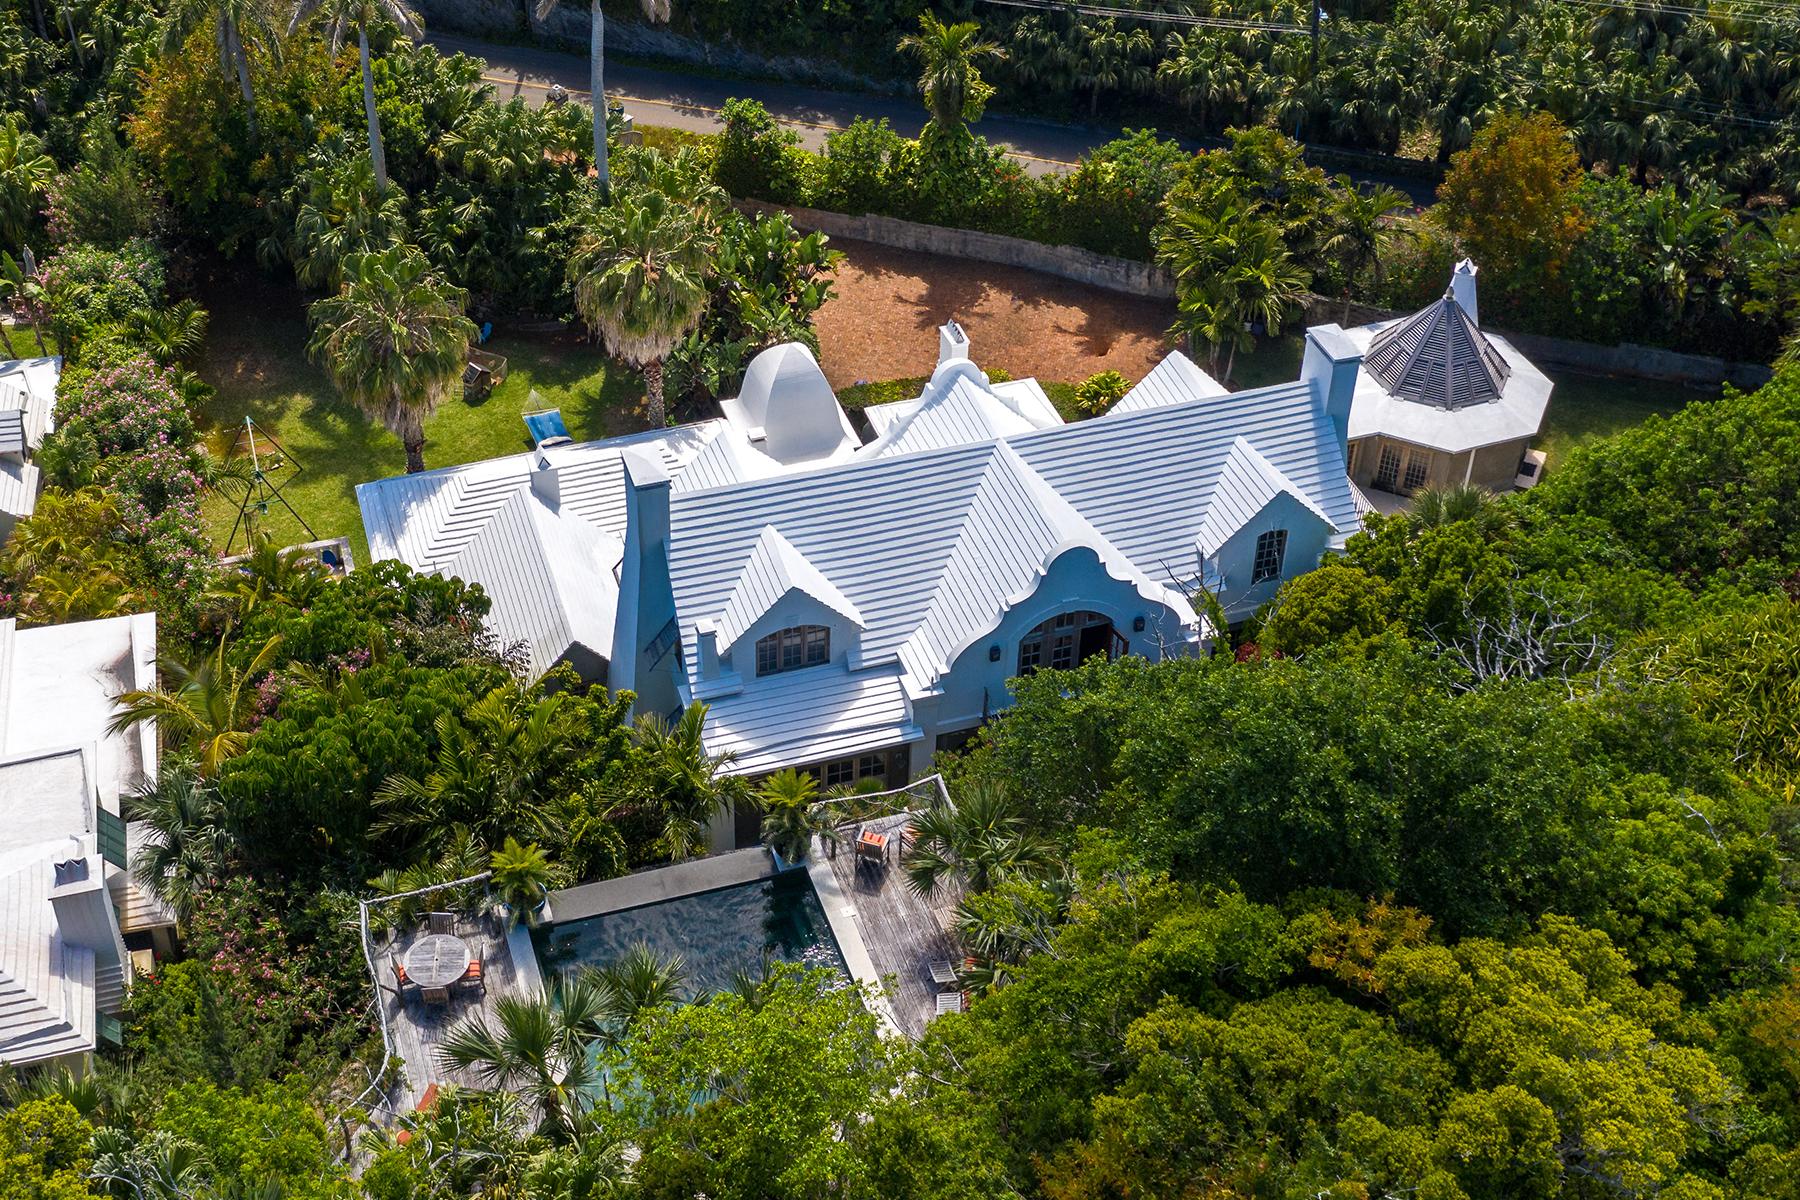 Single Family Homes for Sale at Leamington Caves Estate 46 Harrington Sound Road Hamilton Parish, Other Areas In Bermuda CR04 Bermuda